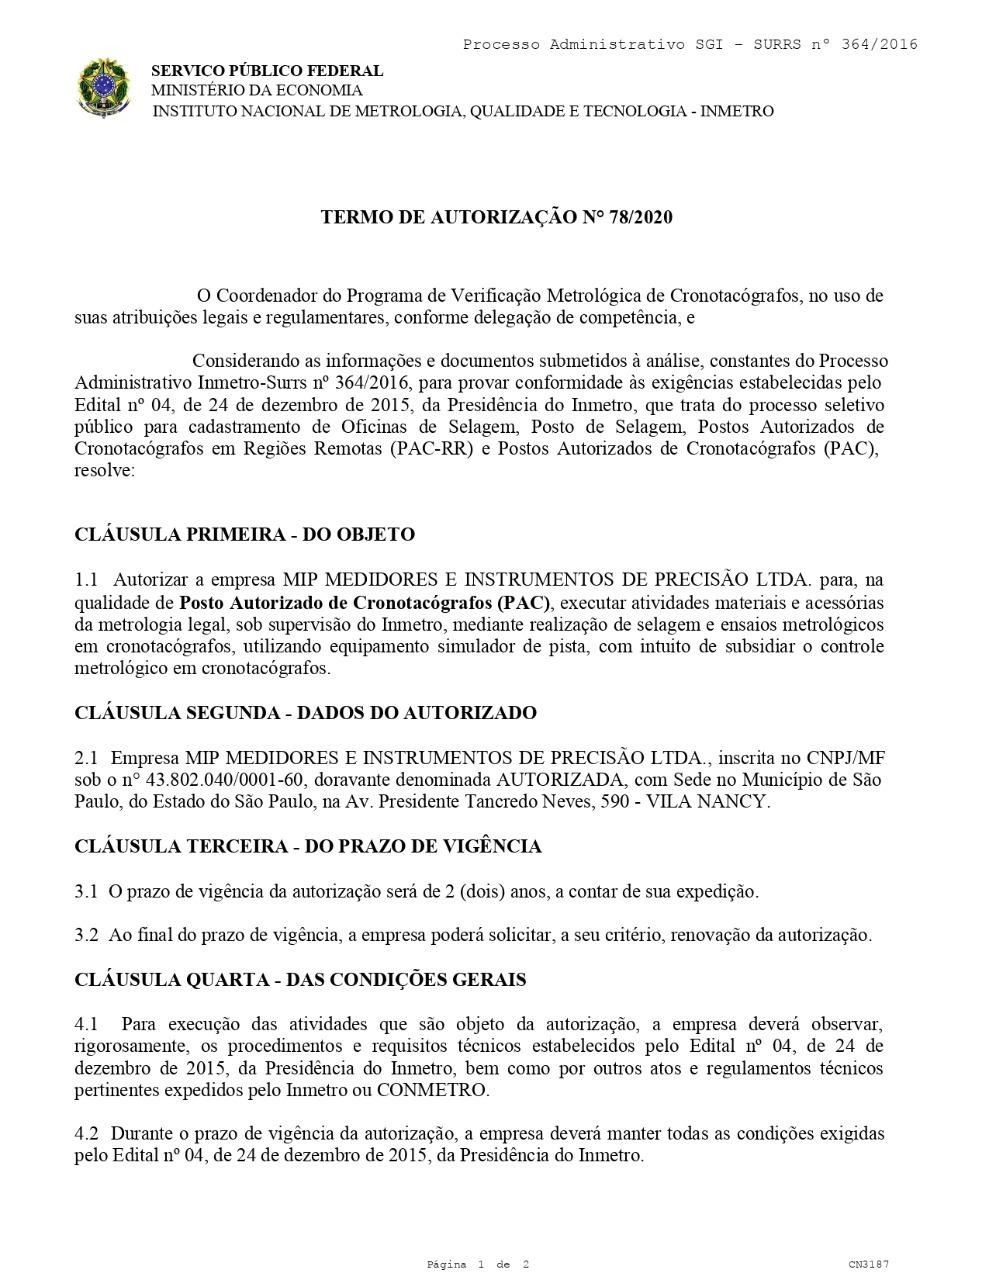 PAC Mip Medidores